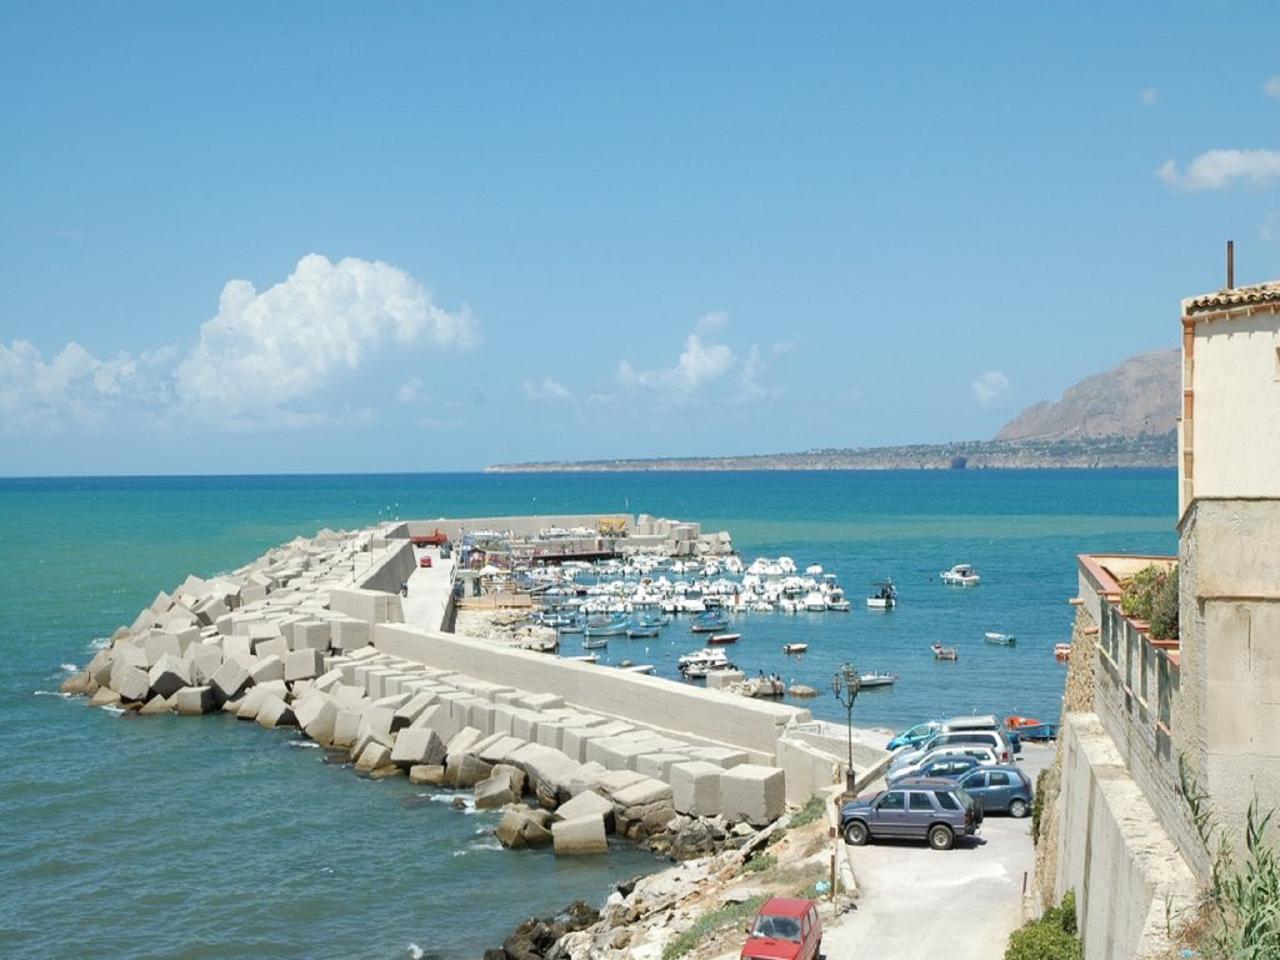 Appartement de vacances casa vacanza alba (642168), Trappeto, Palermo, Sicile, Italie, image 19